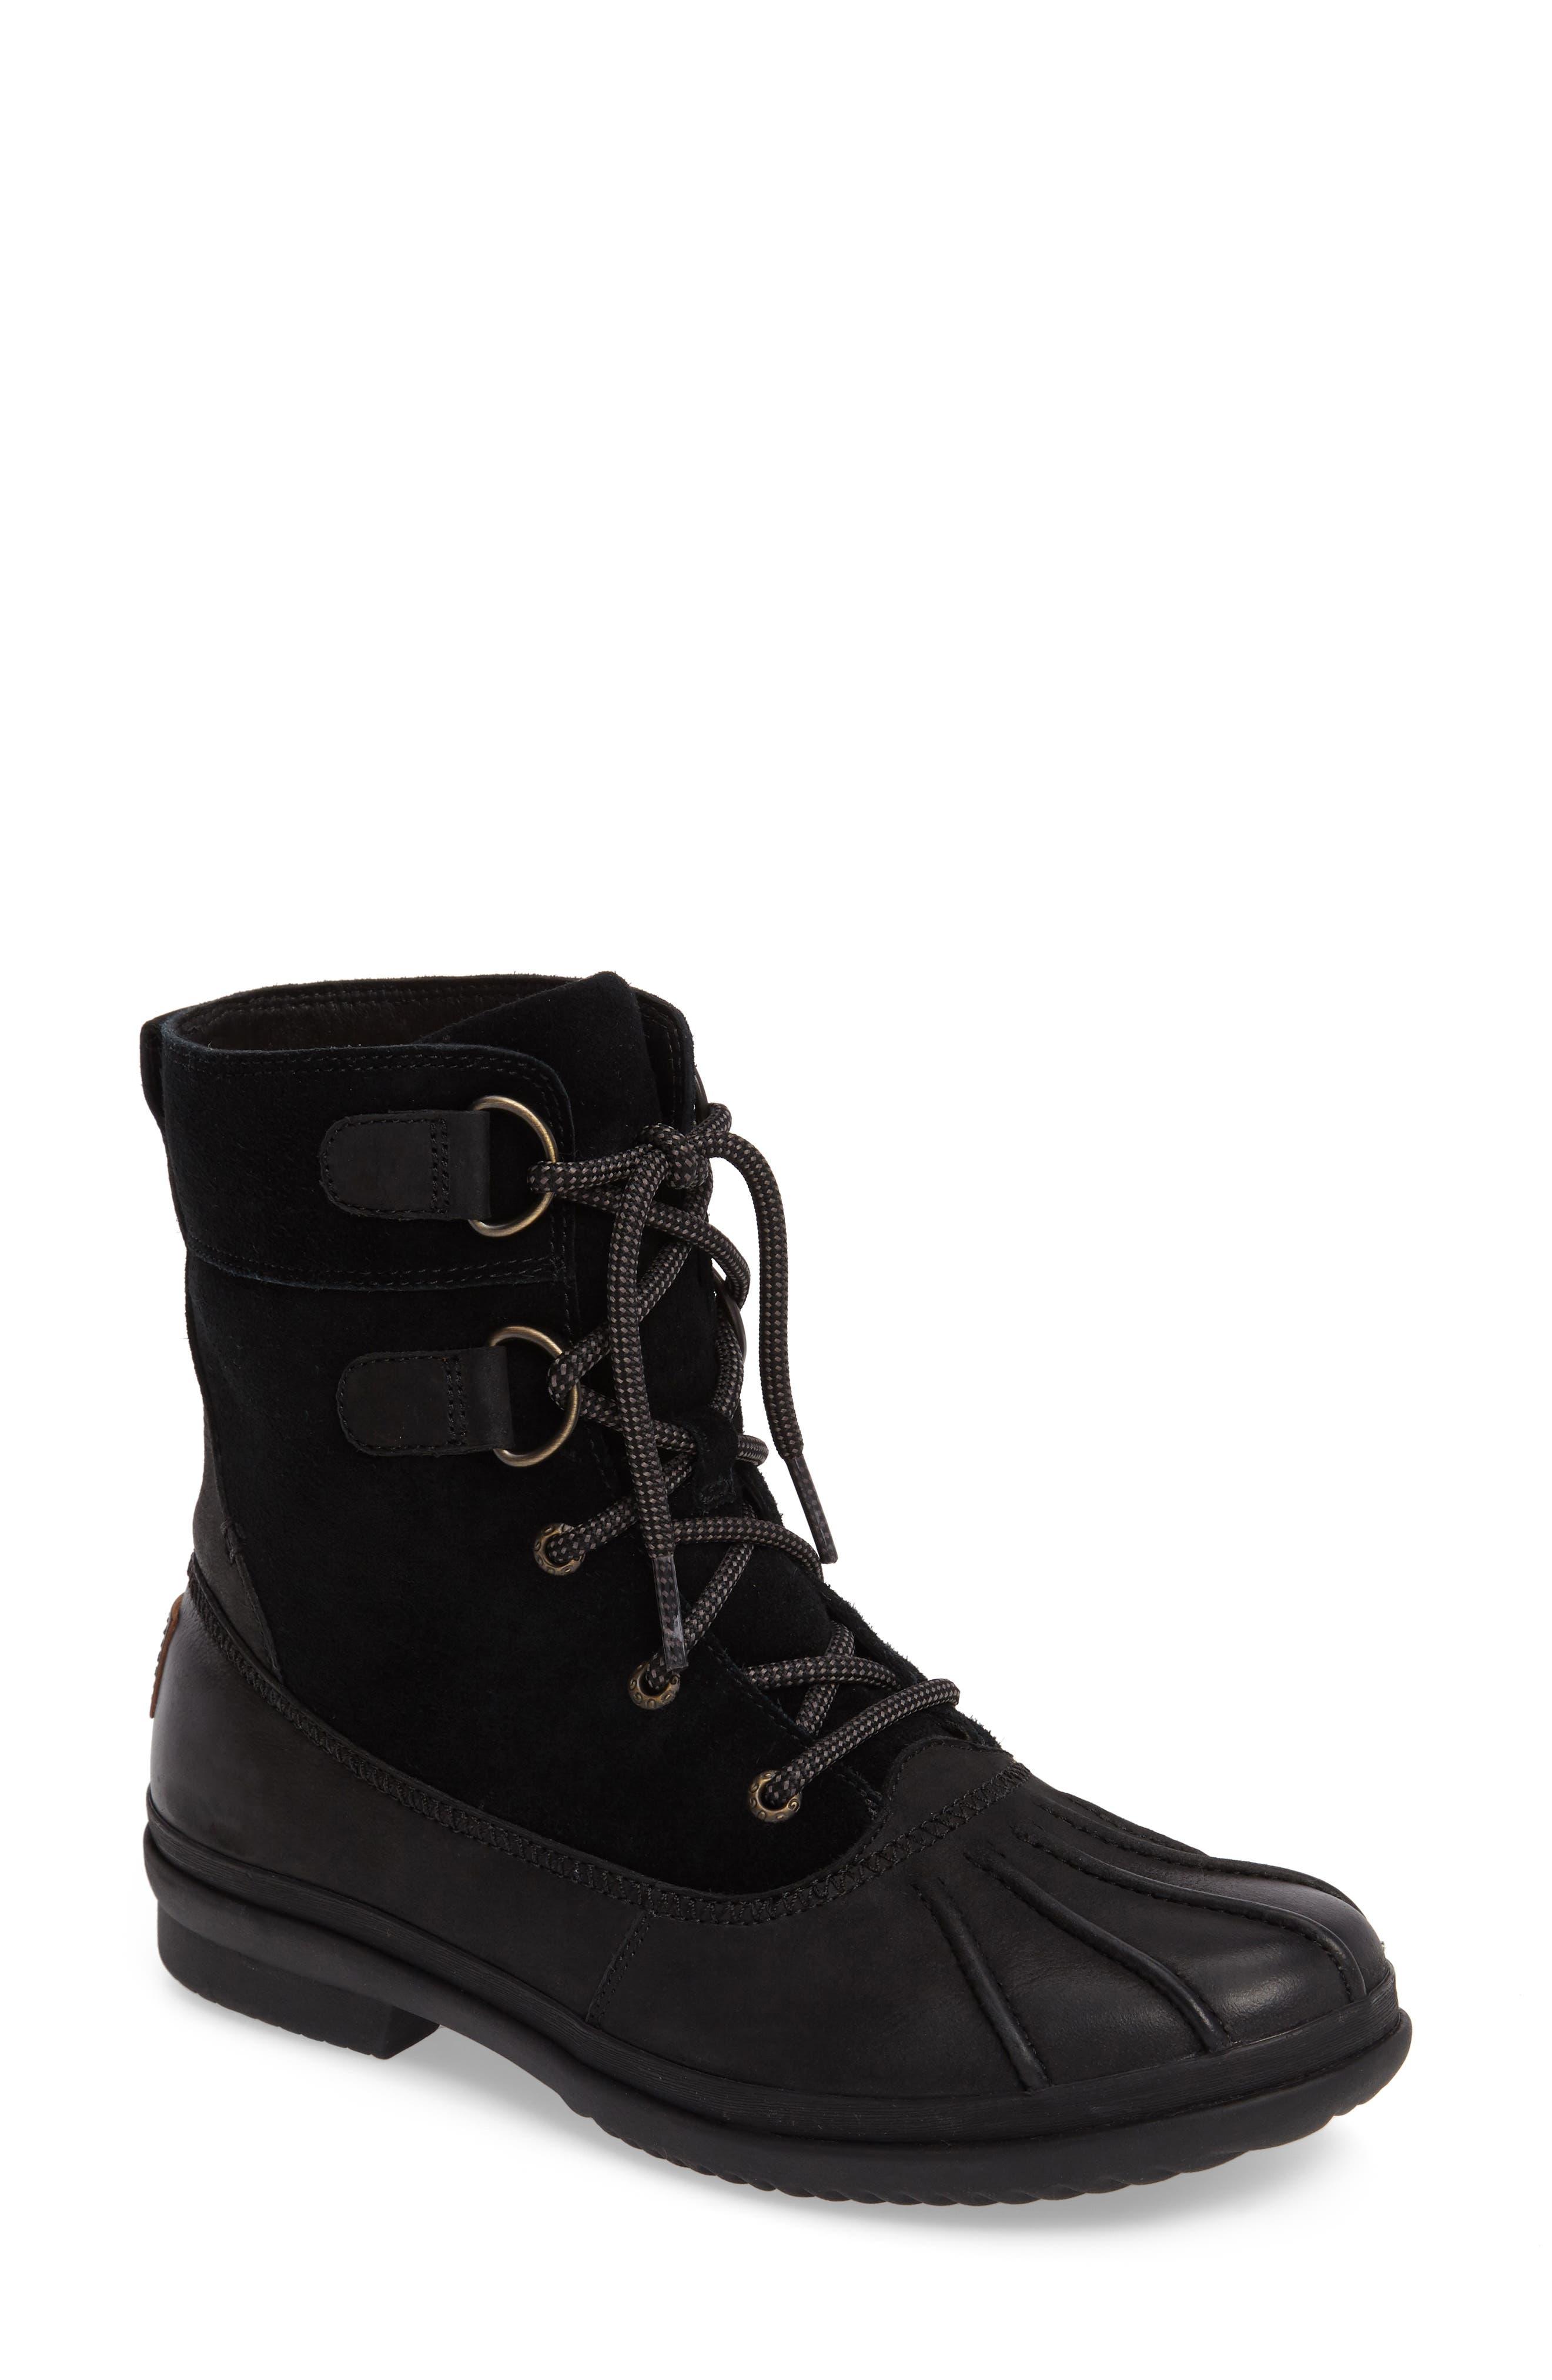 Azaria Waterproof Boot,                         Main,                         color, 001